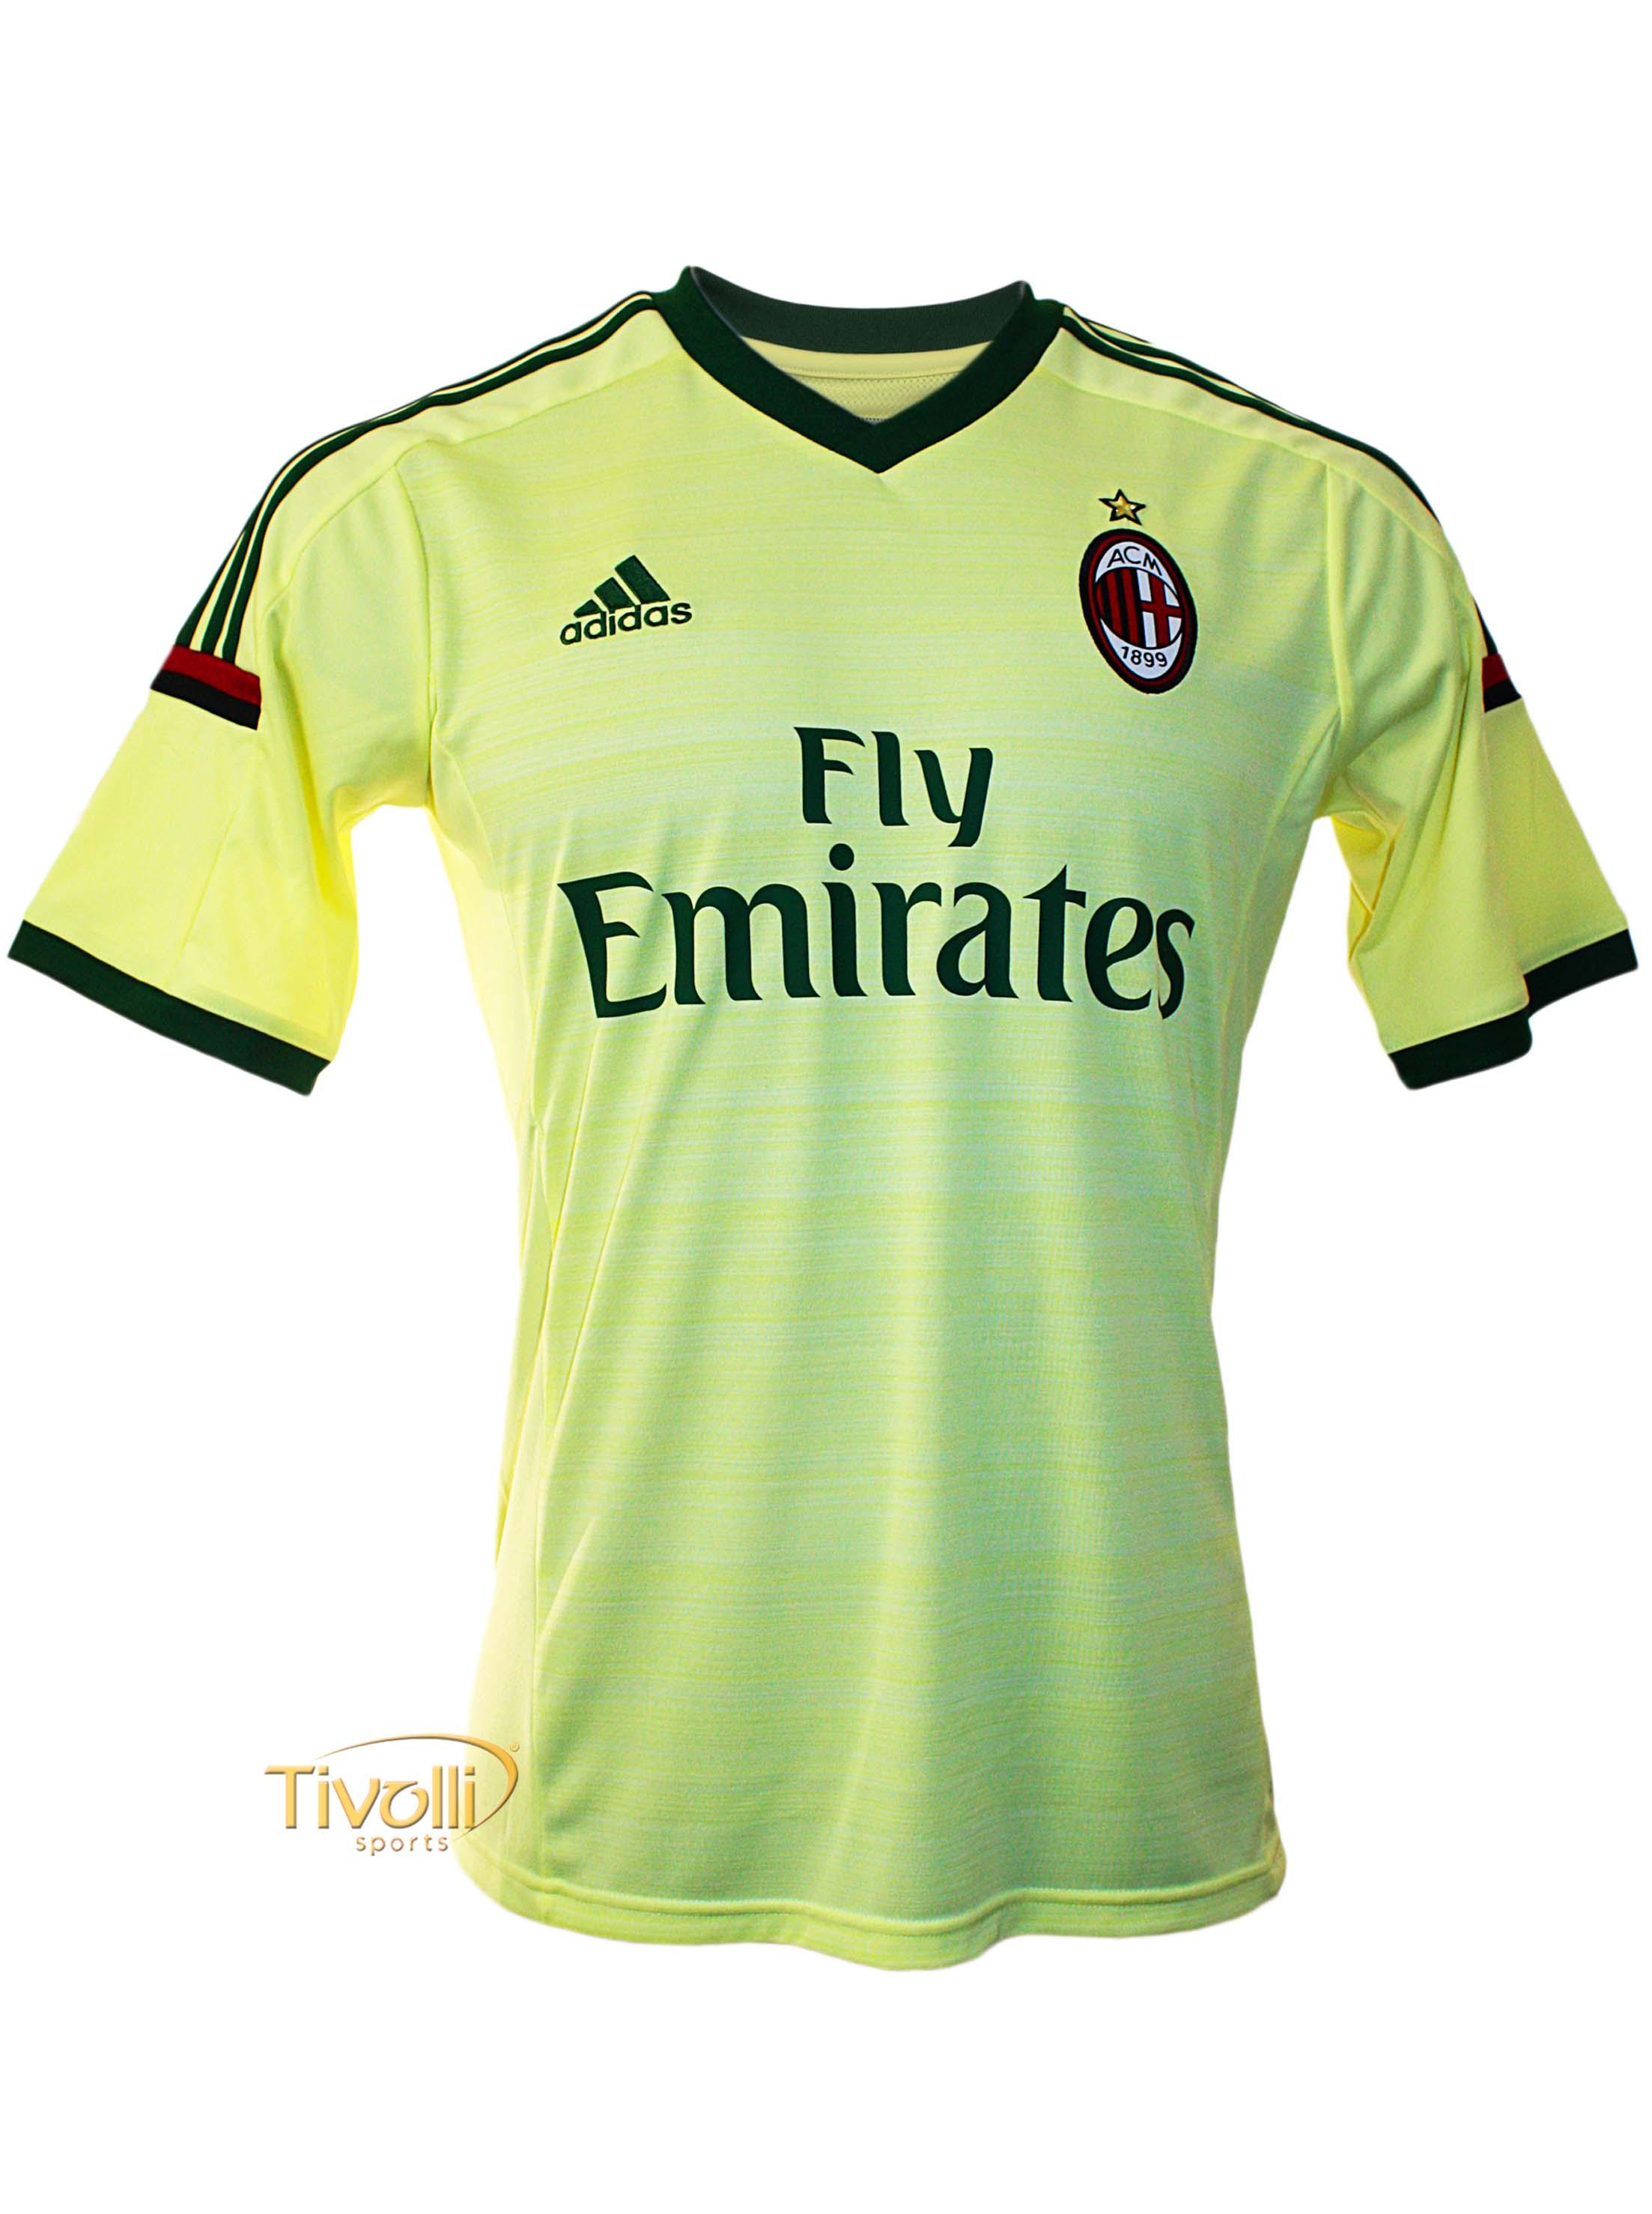 Camisa Milan III 2013 2014 Adidas. - Mega Saldão f123425b6a700